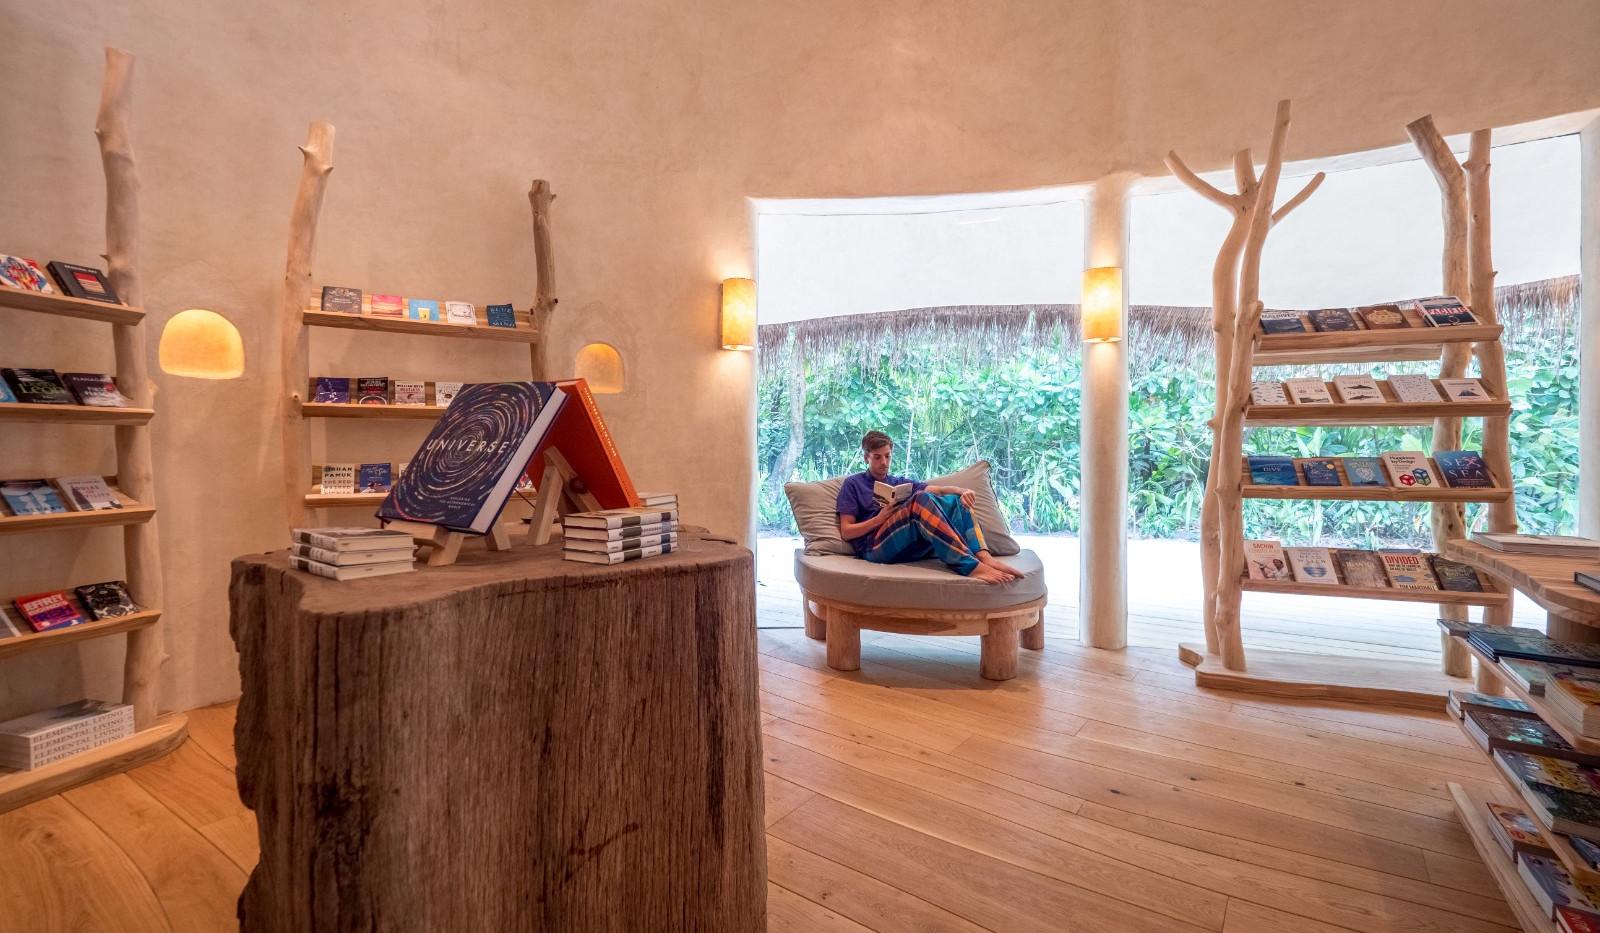 The Barefoot Bookseller bookshop by Julia Neeson📸